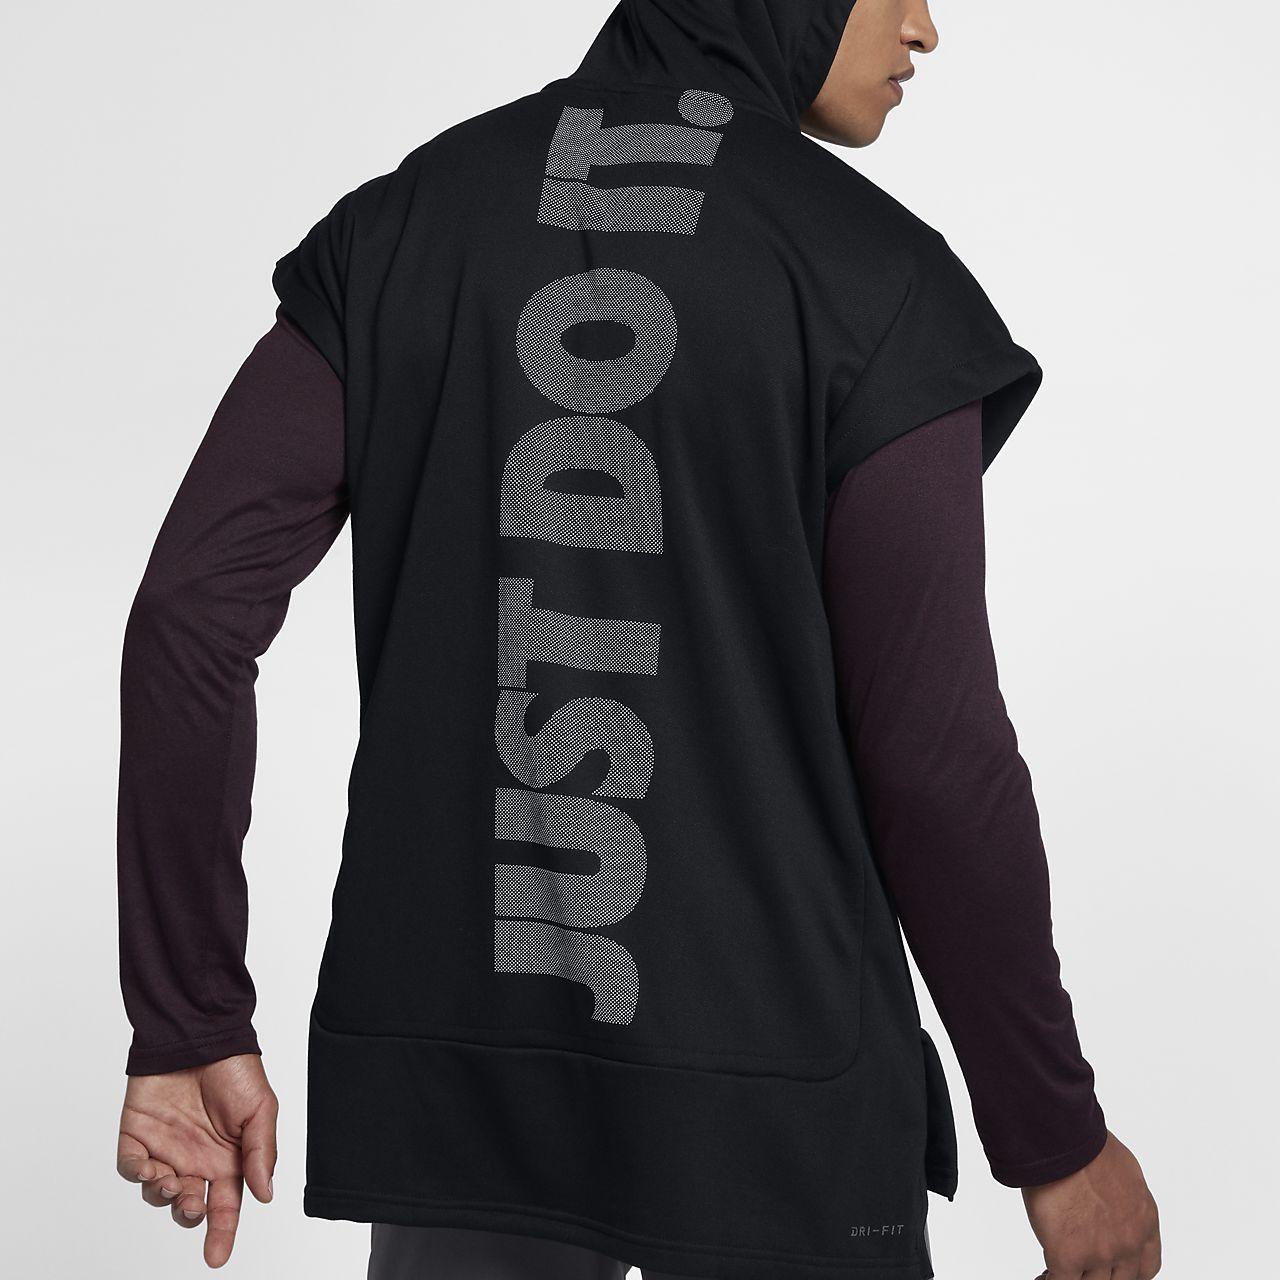 64ae21bc Nike Dri-FIT Men's Sleeveless Training Hoodie | Fitness | Mens ...